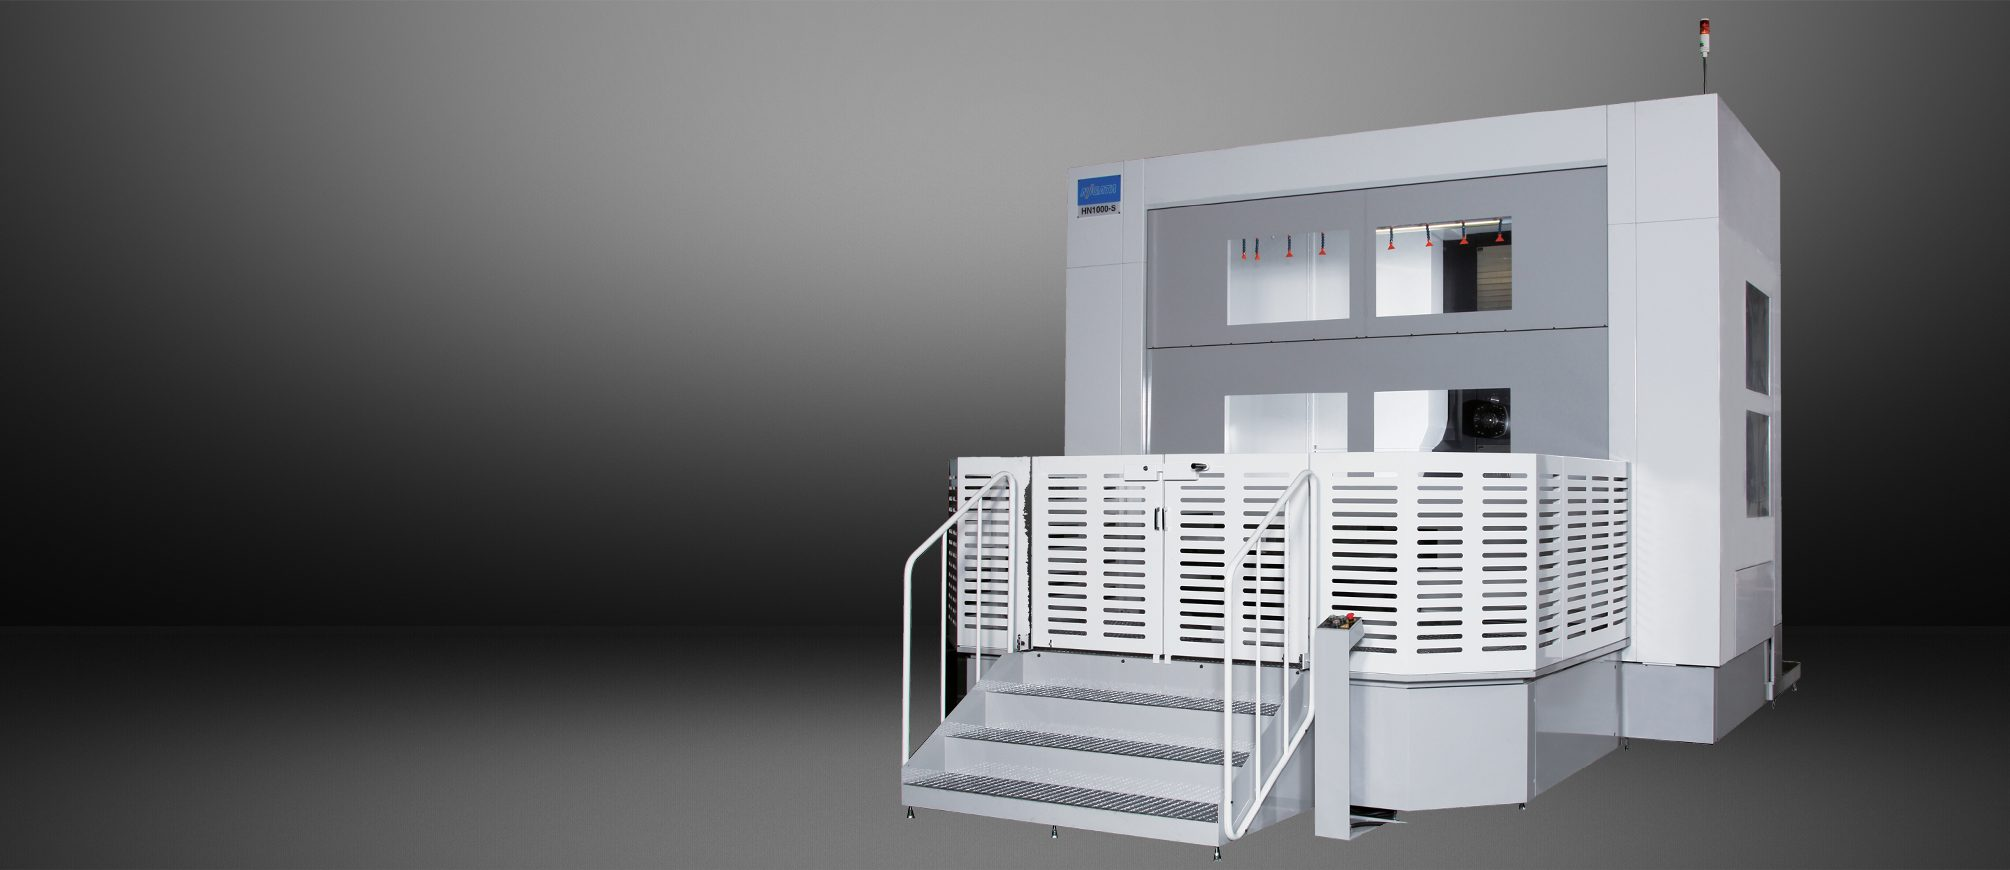 HN1000-S BAR Horizontal Machining Centers